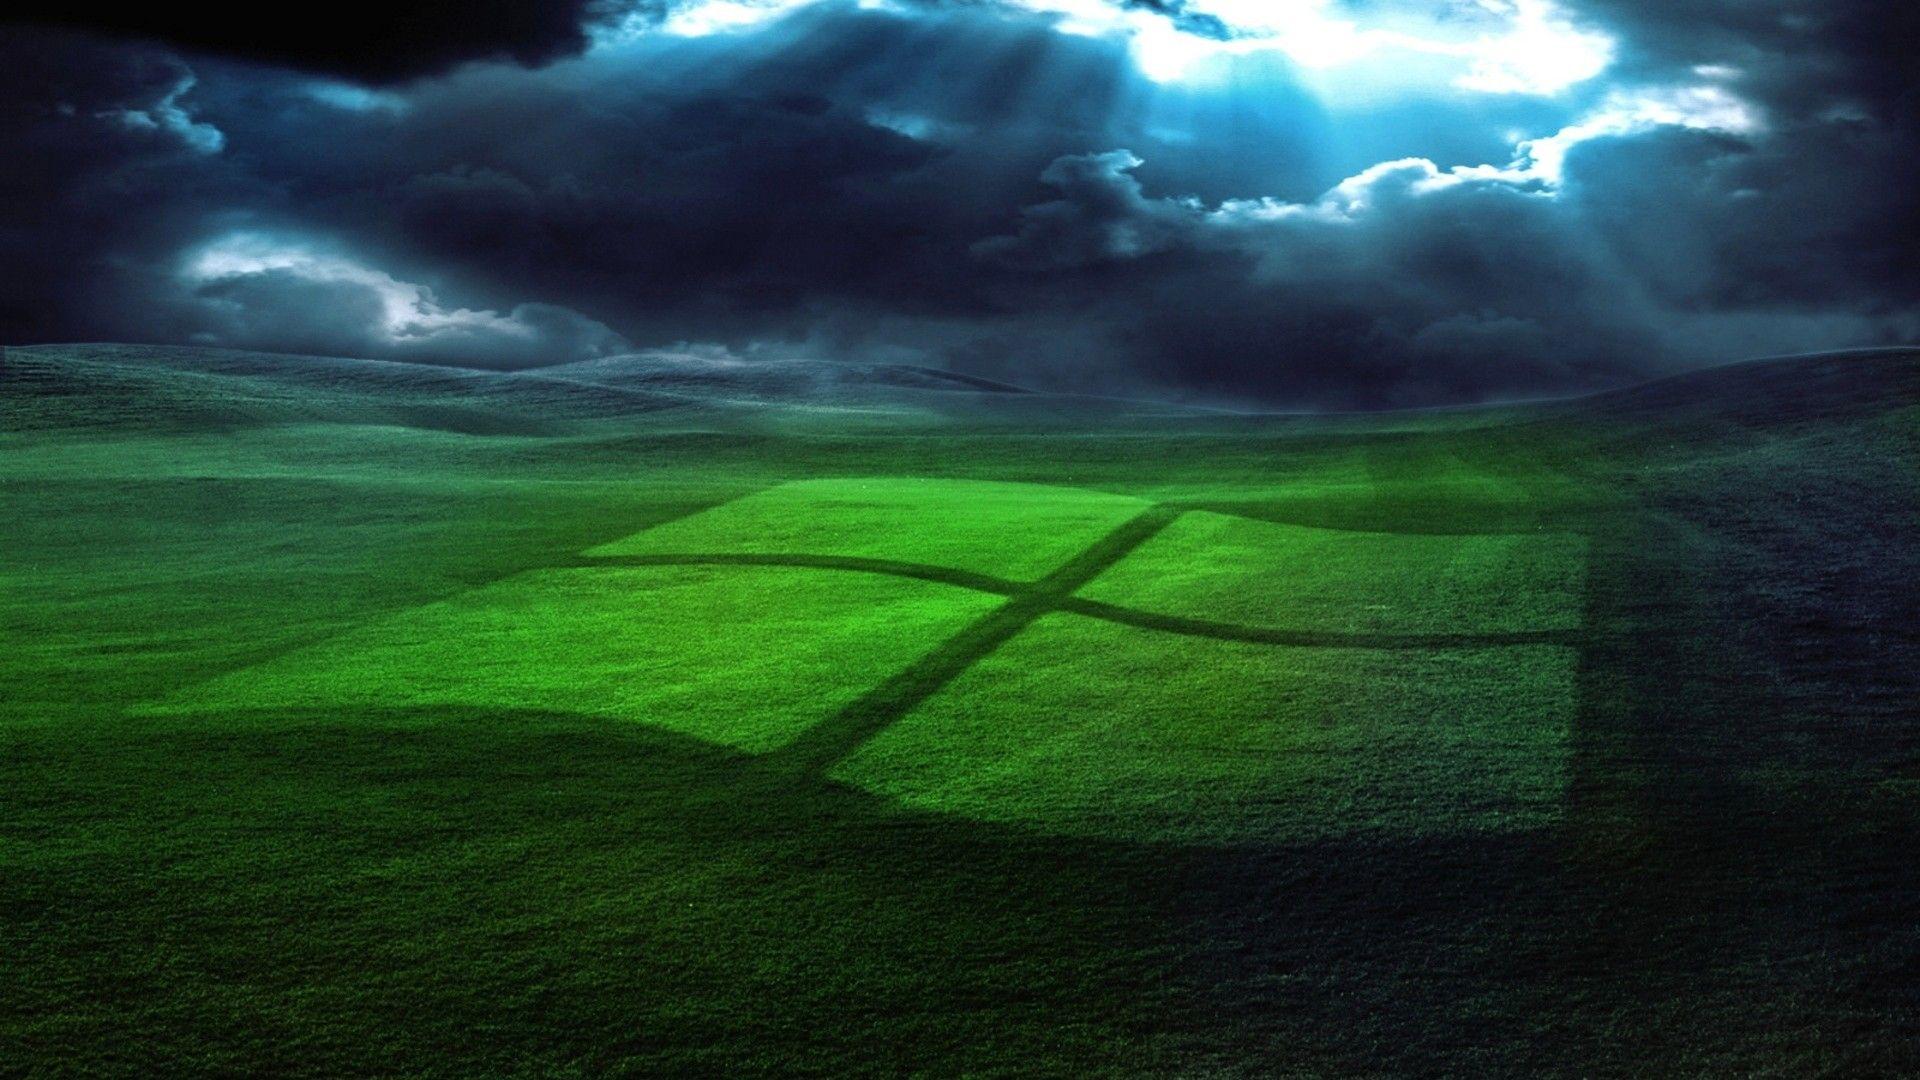 Windows 10 2004 issues